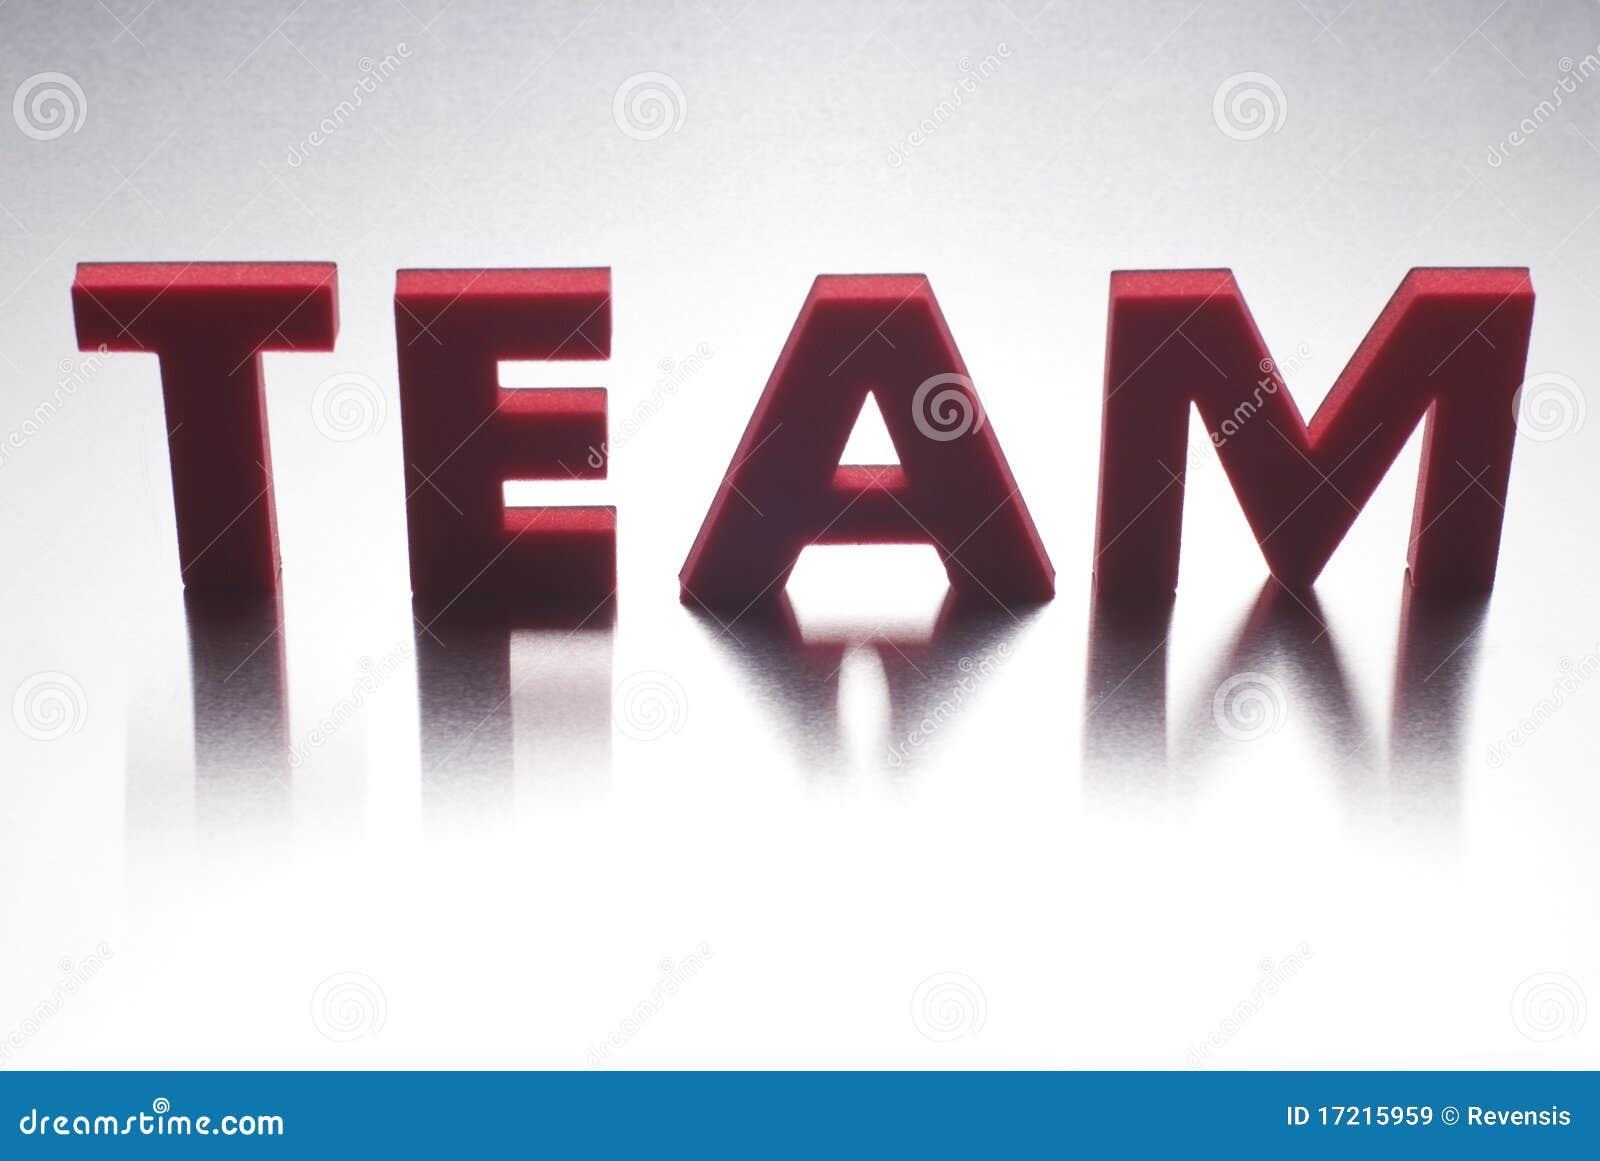 team word stock image  image of modern  light  business